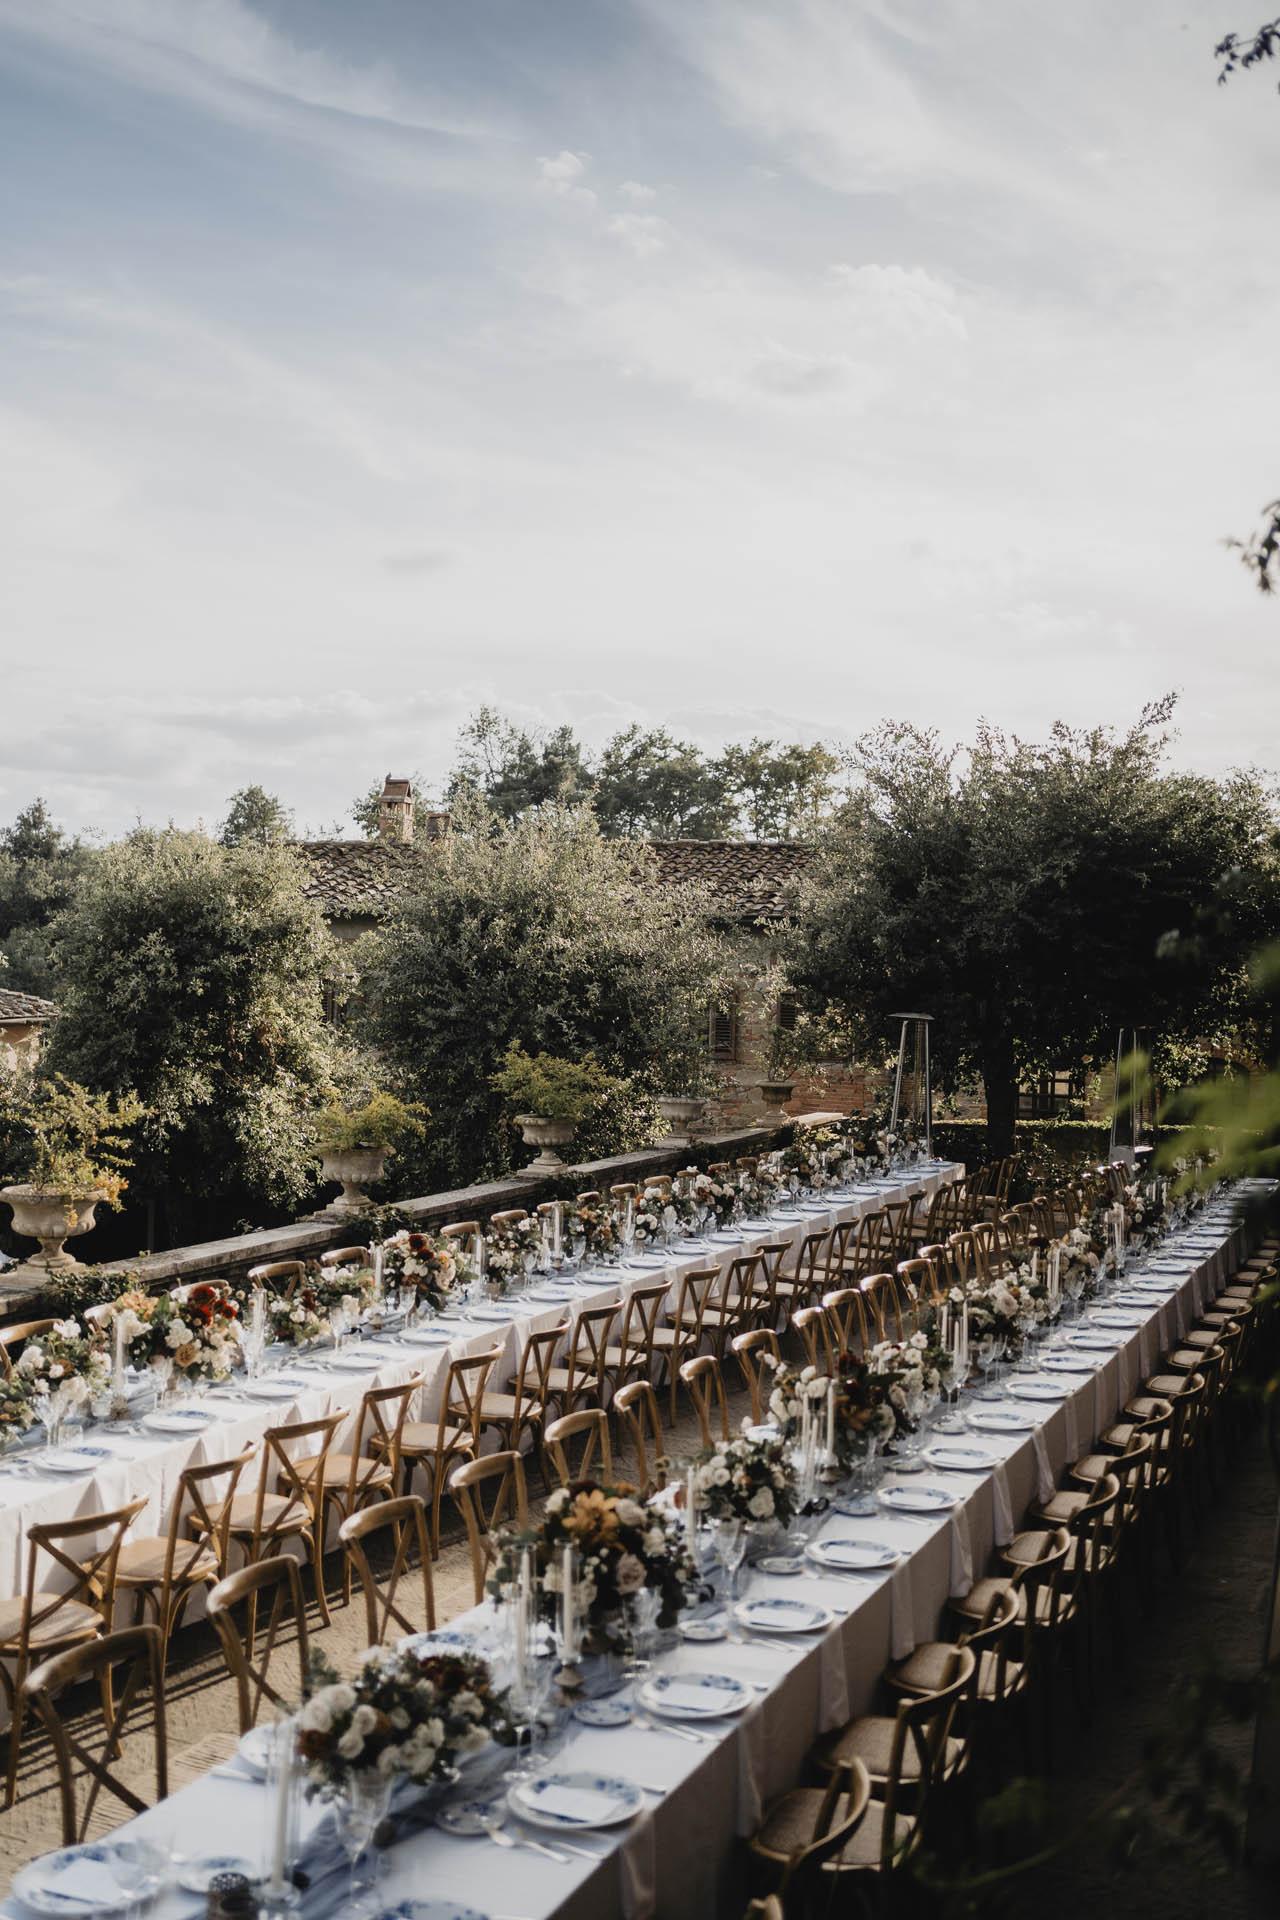 - 55 :: Intimate elegance: an intimate wedding at Il Borro :: Luxury wedding photography - 54 ::  - 55